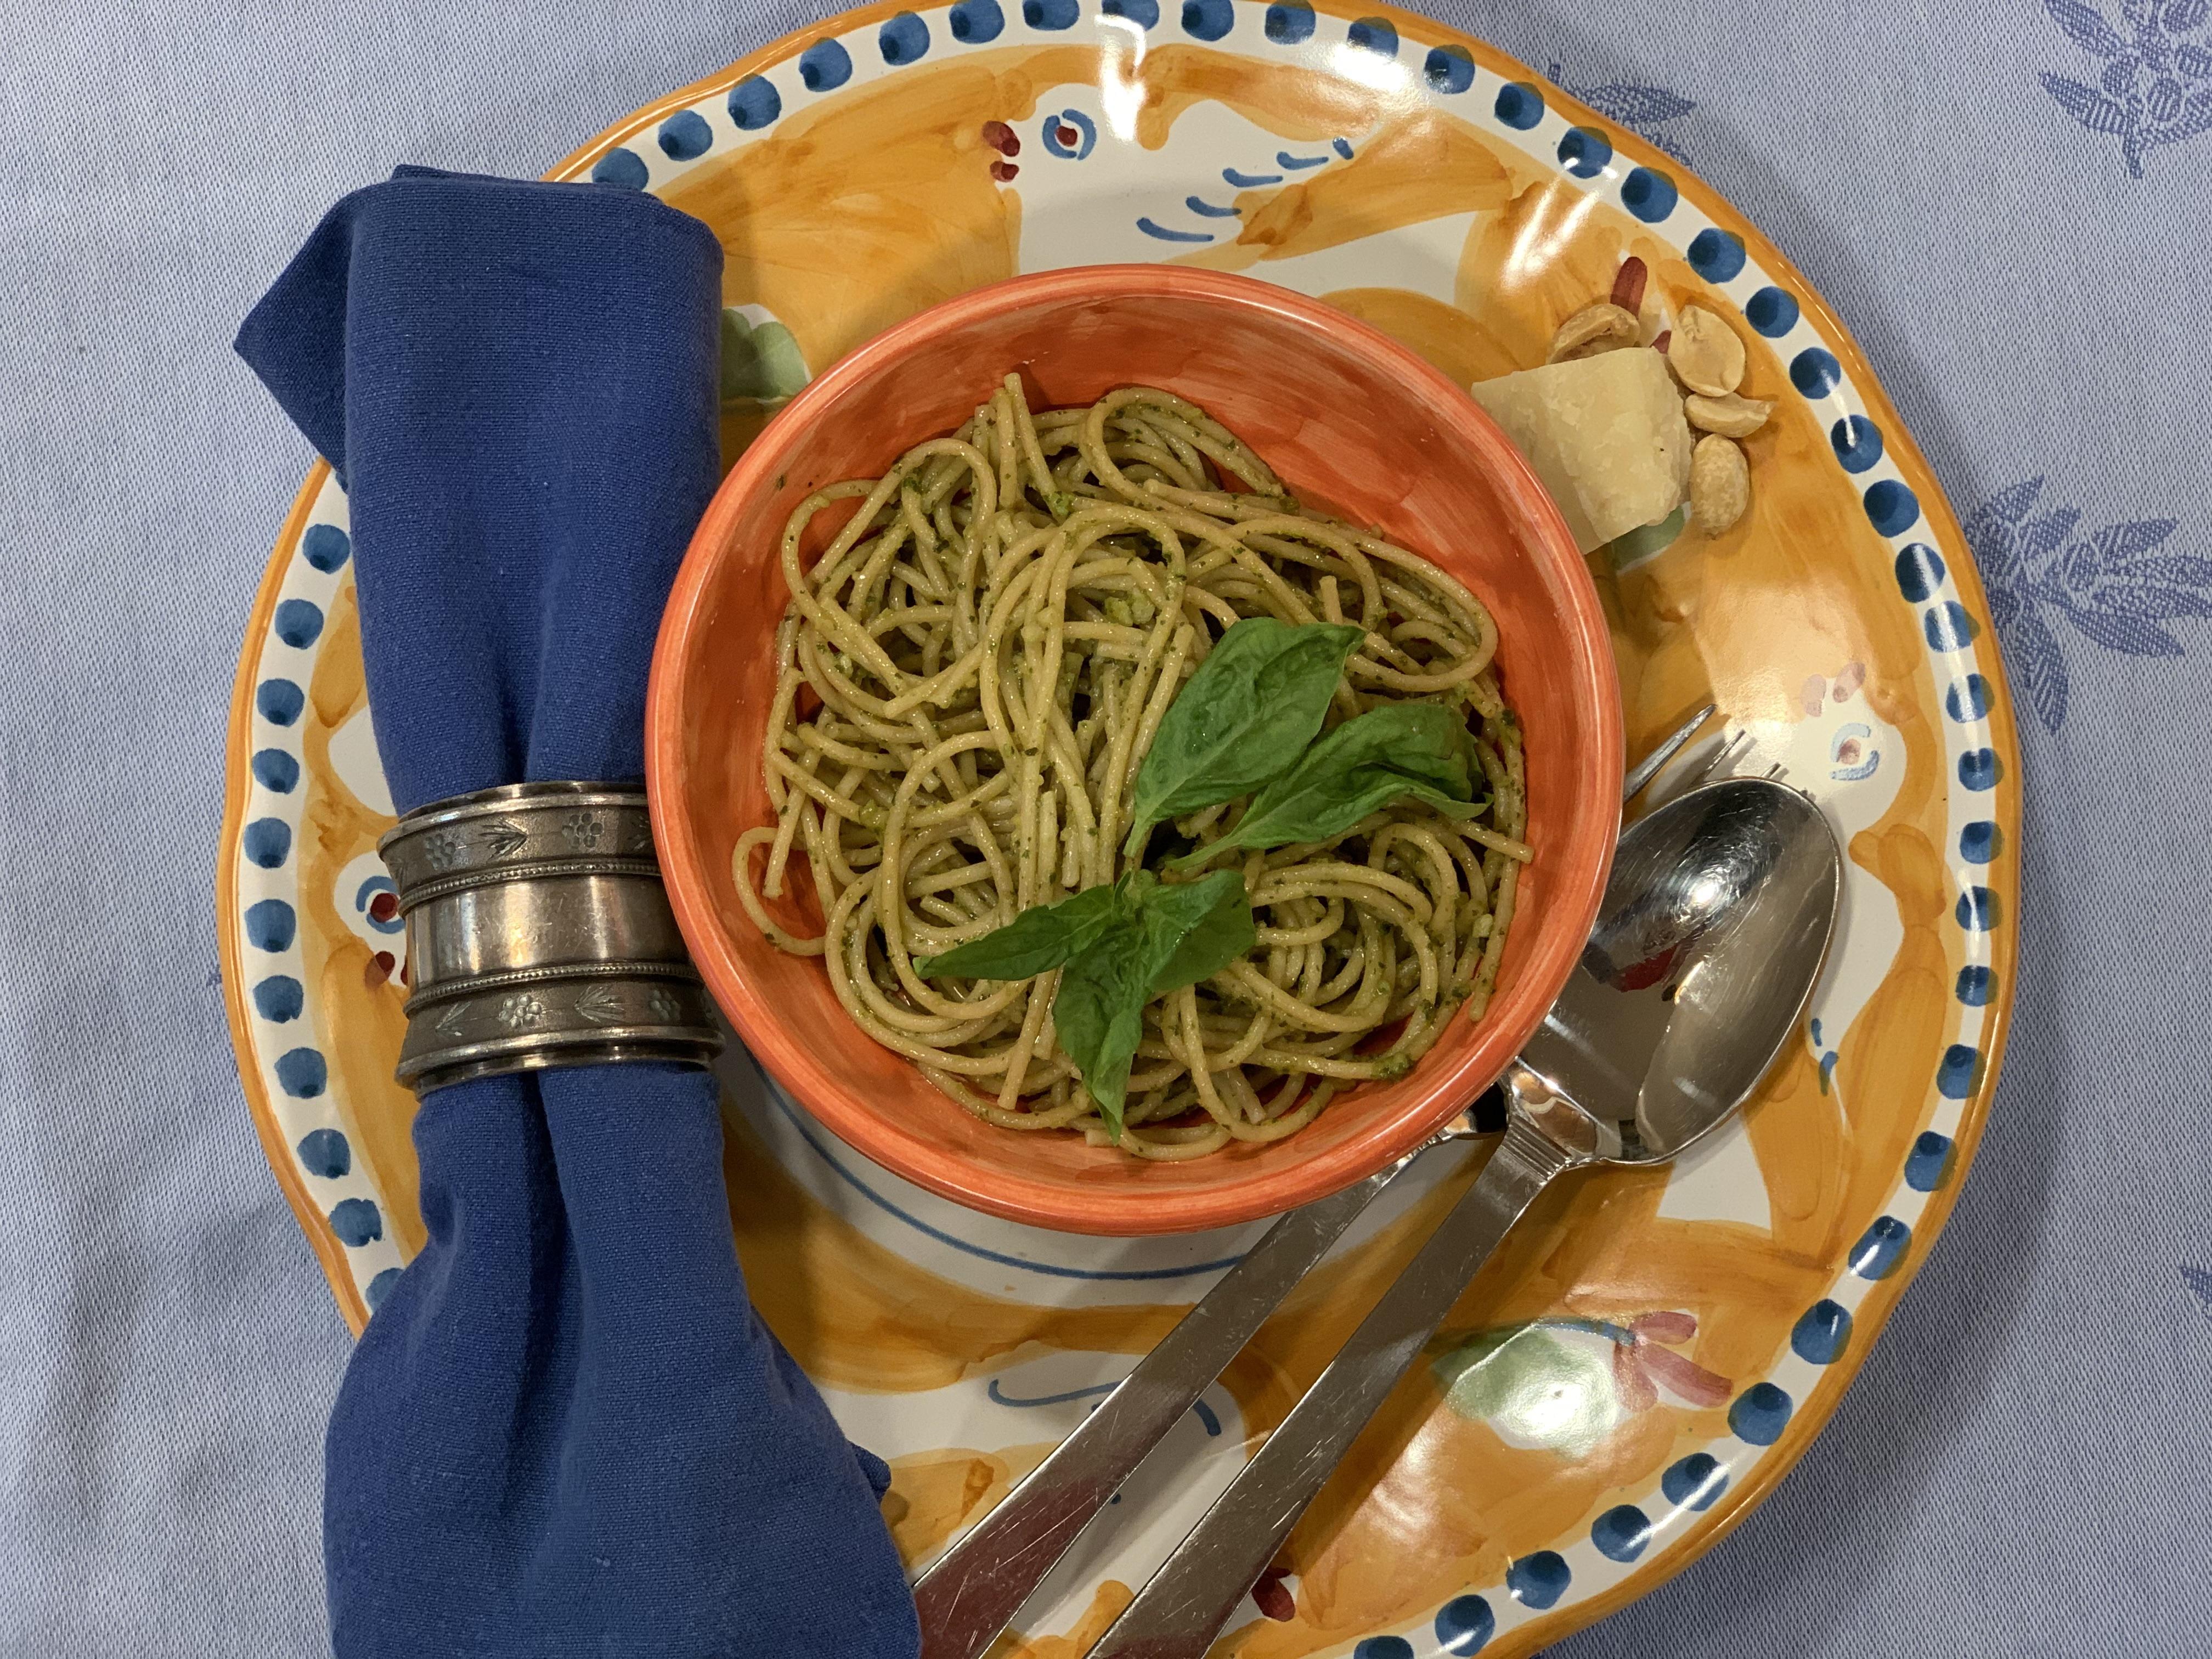 bowl of spaghetti with pesto sauce atop a colorful dish